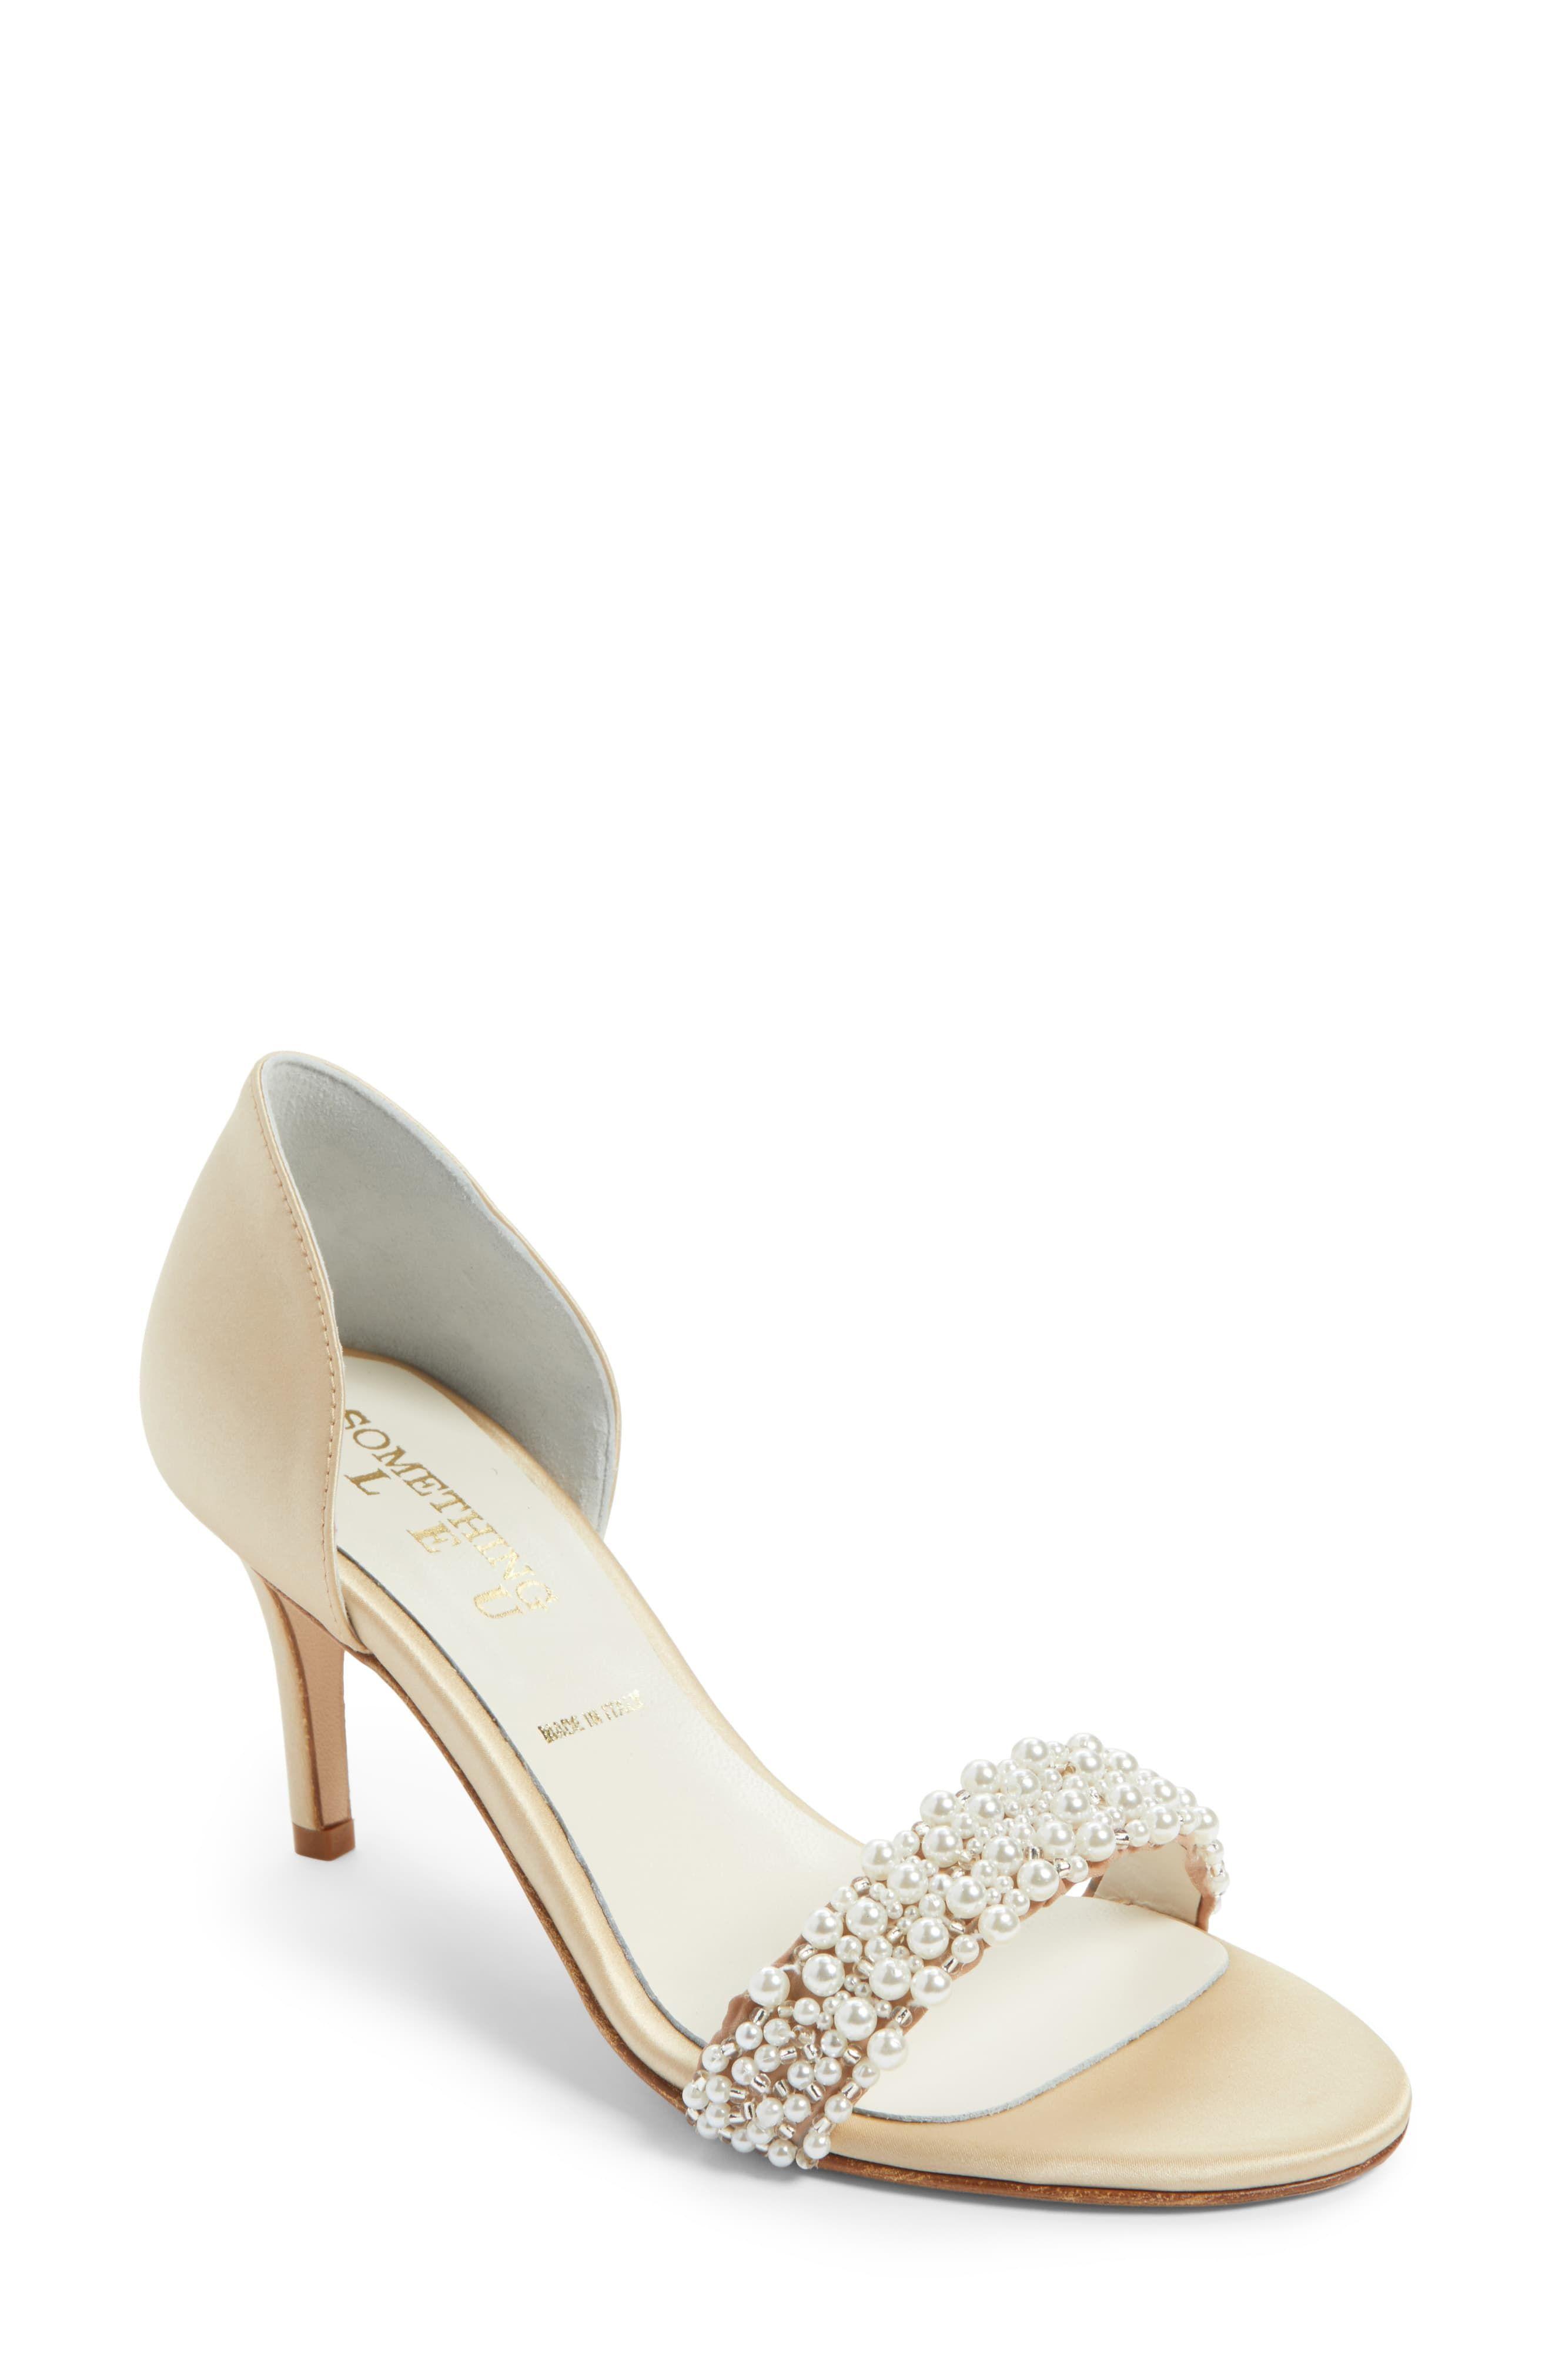 Evening shoes low heel, Womens sandals